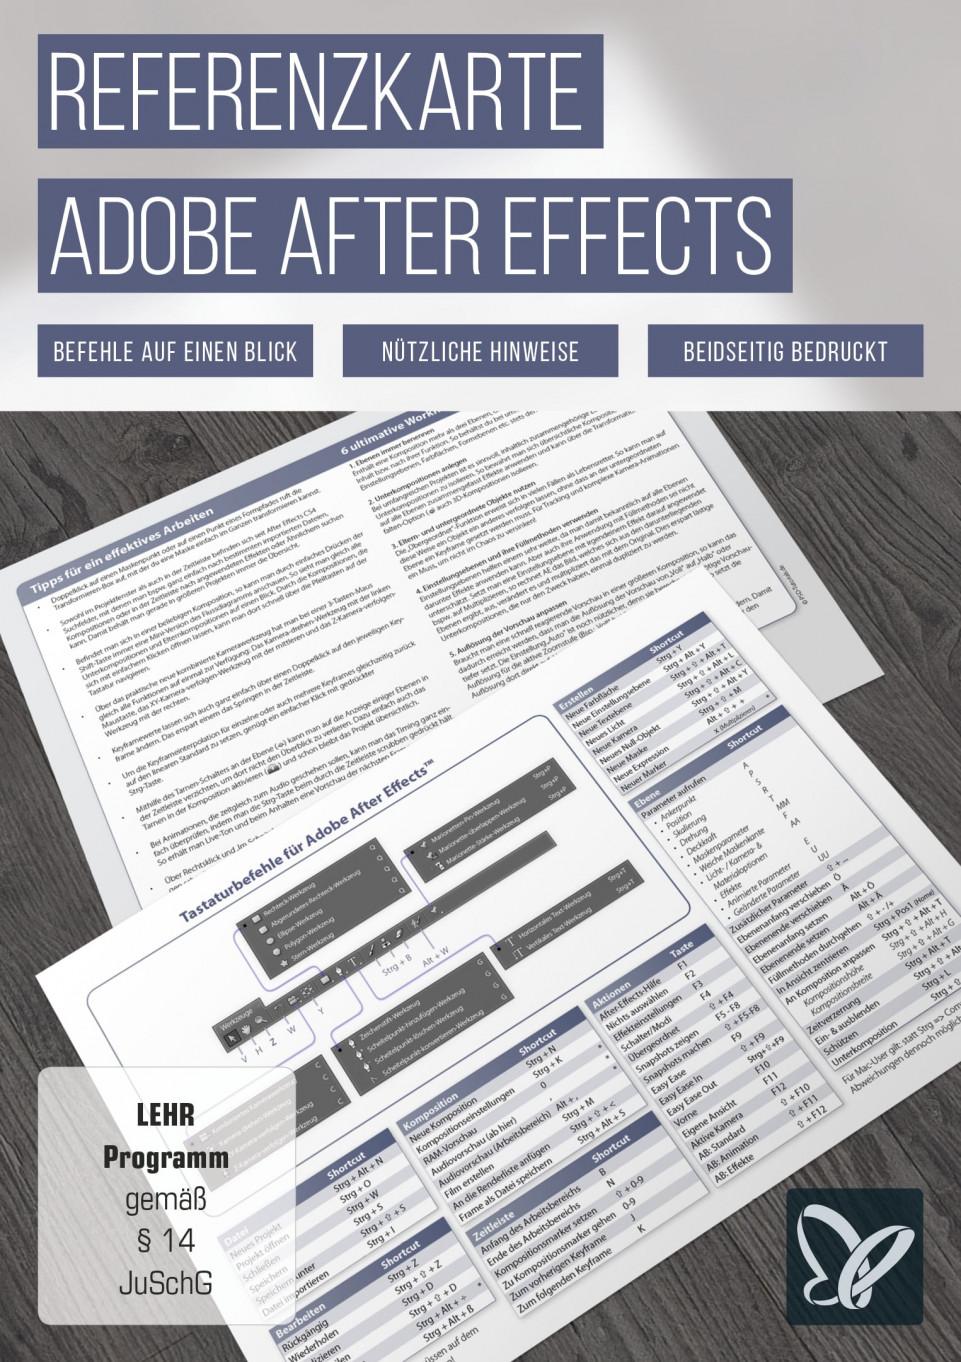 After Effects-Referenzkarte